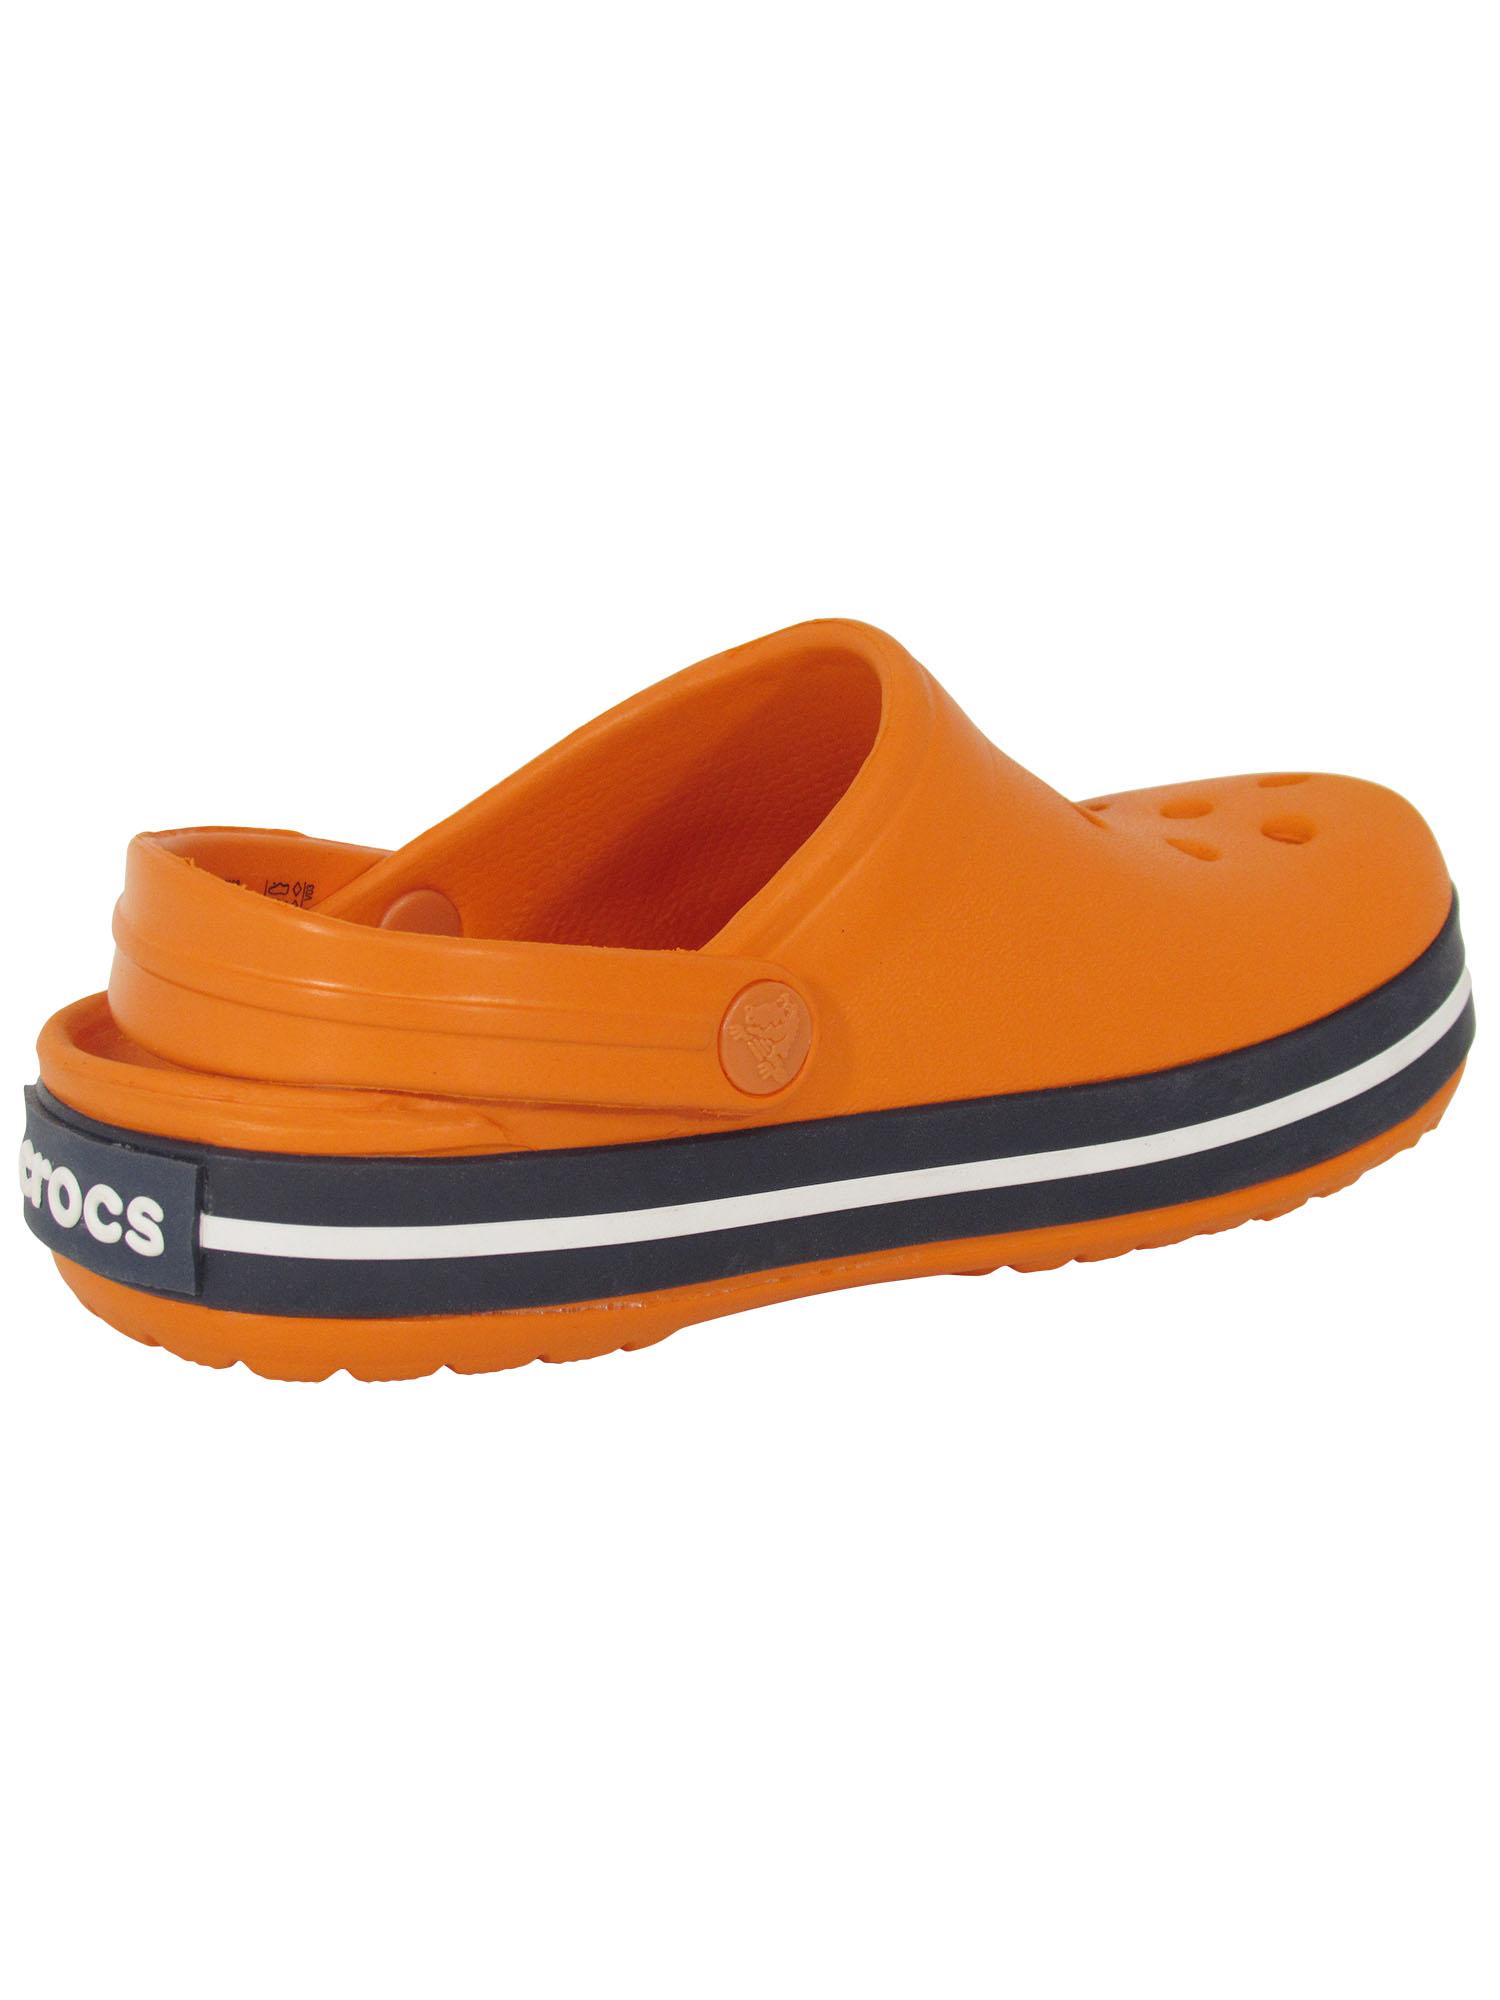 Crocs-Crocband-Kids-Slip-On-Clog-Shoes thumbnail 10